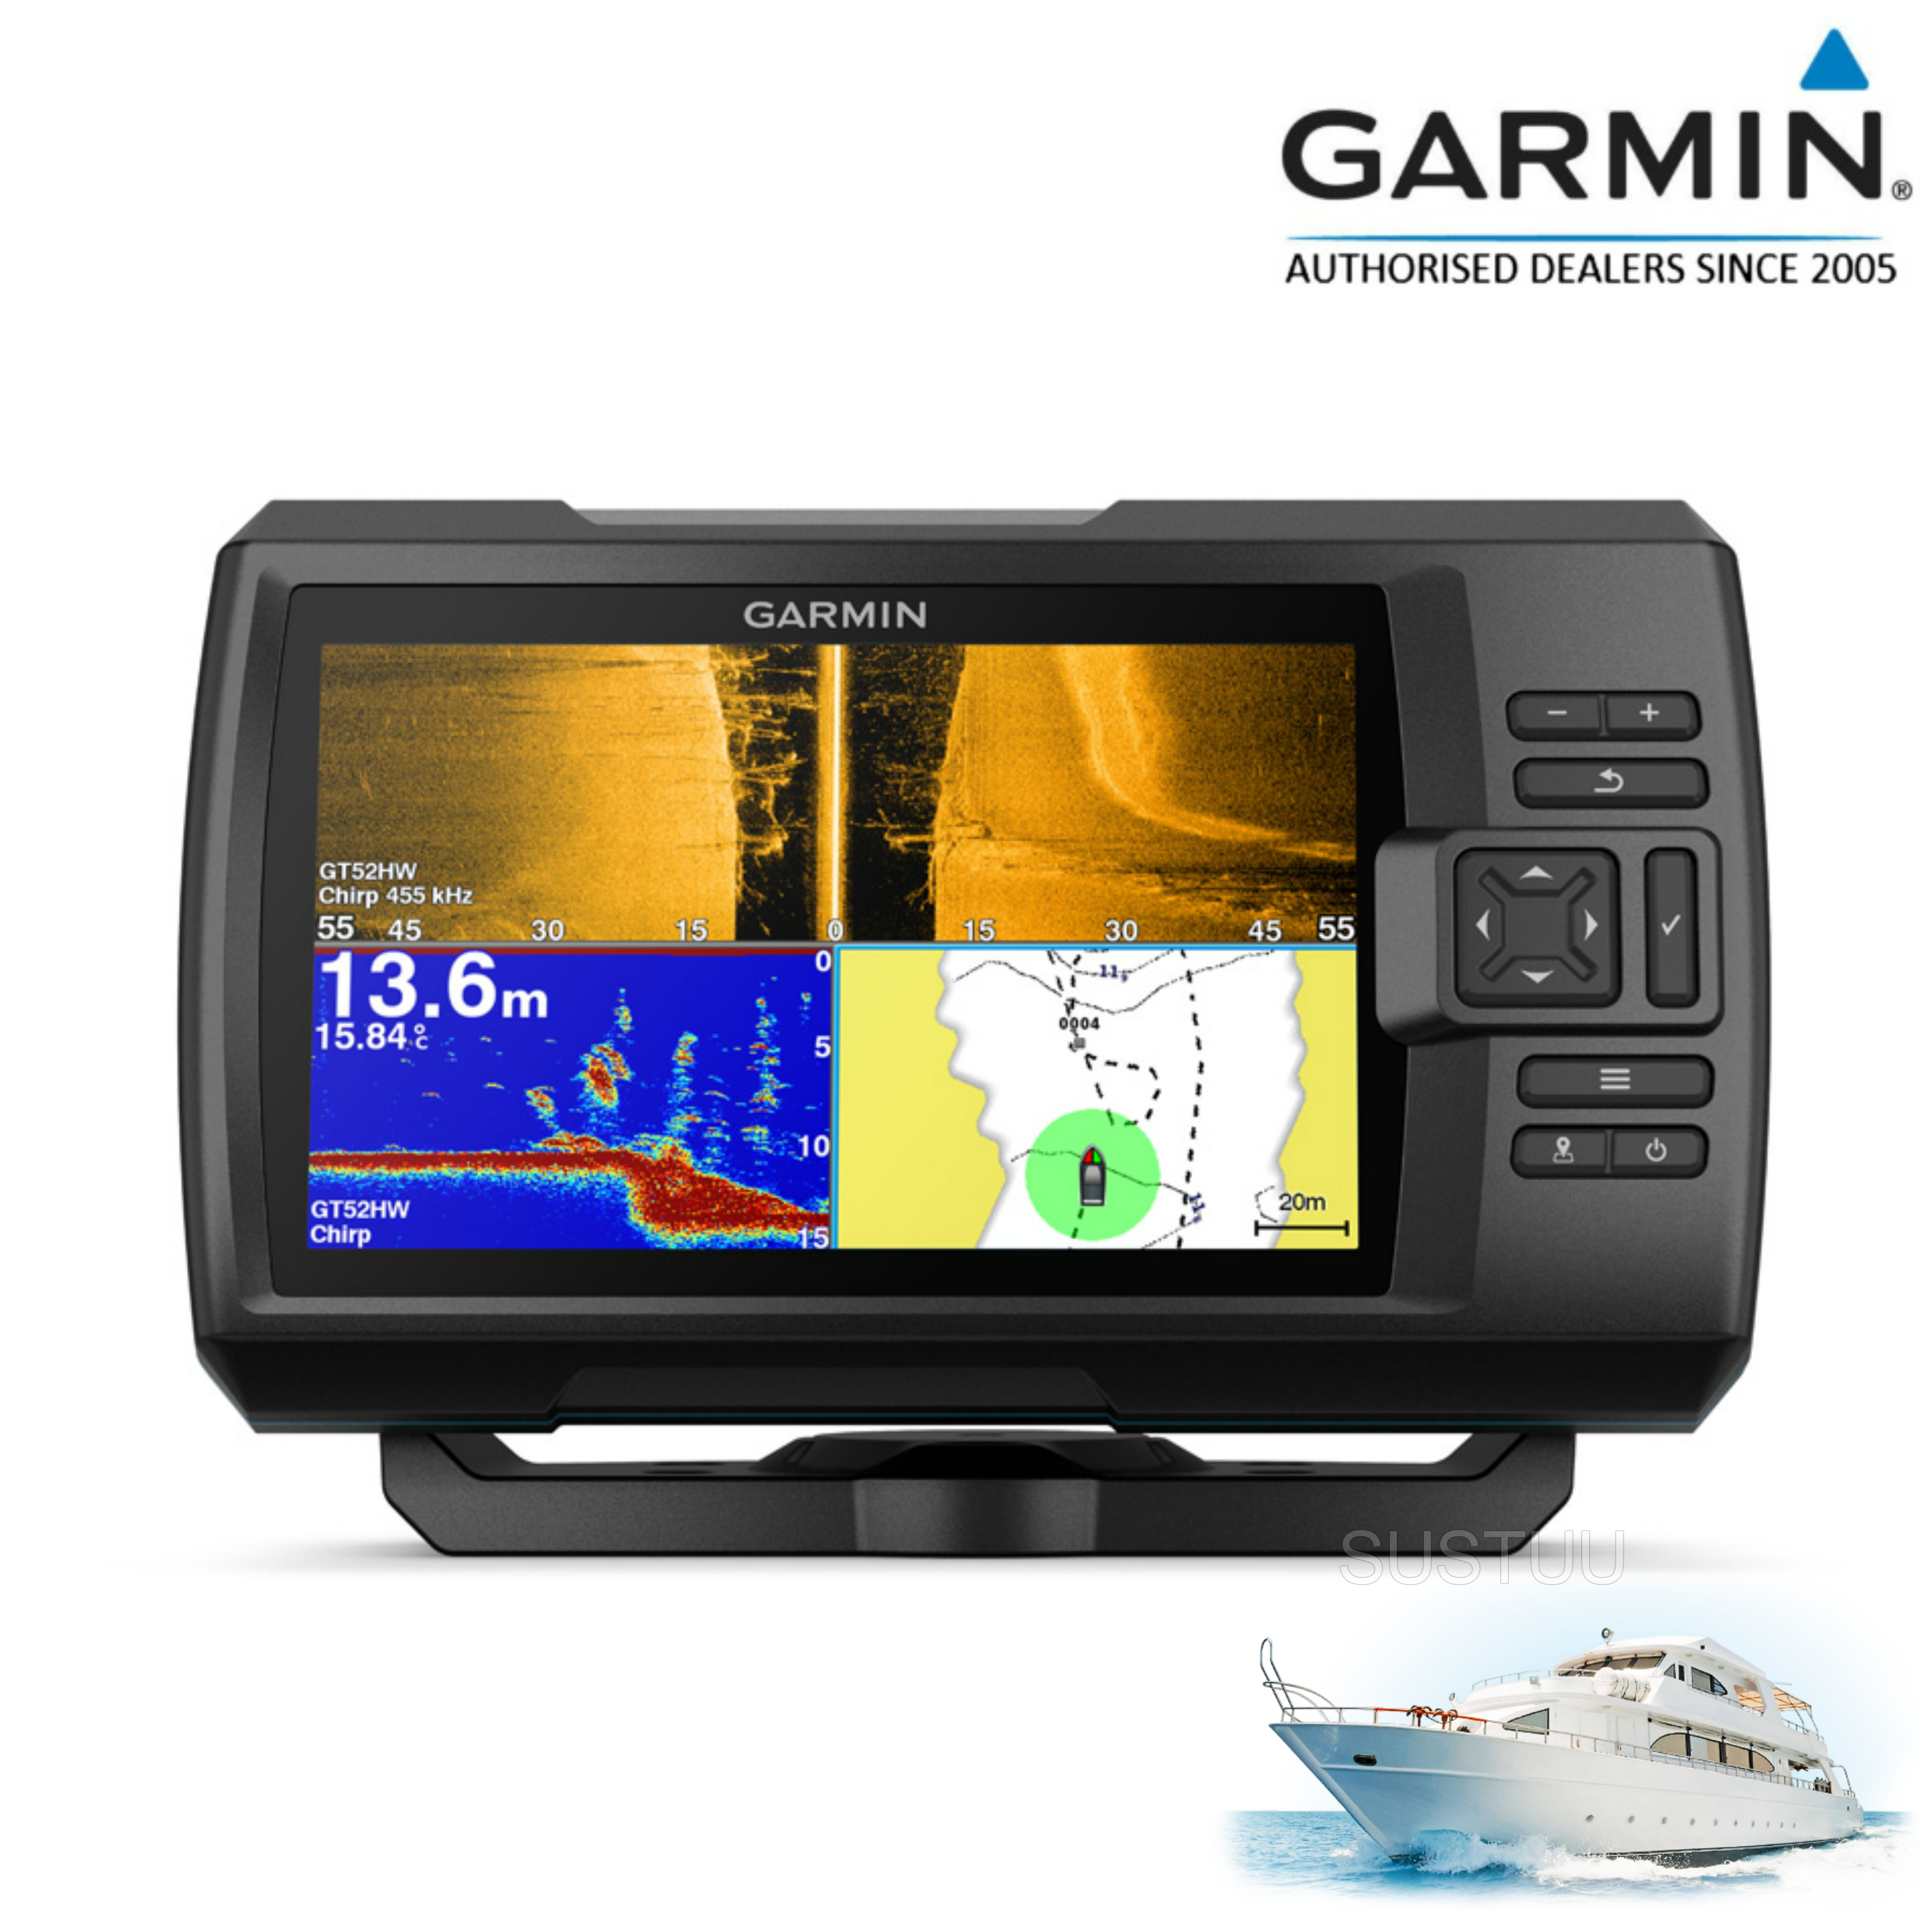 Garmin STRIKER Plus 7' Display|Transom Transducer|IPX7|GPS|Fish Finder|In Marine